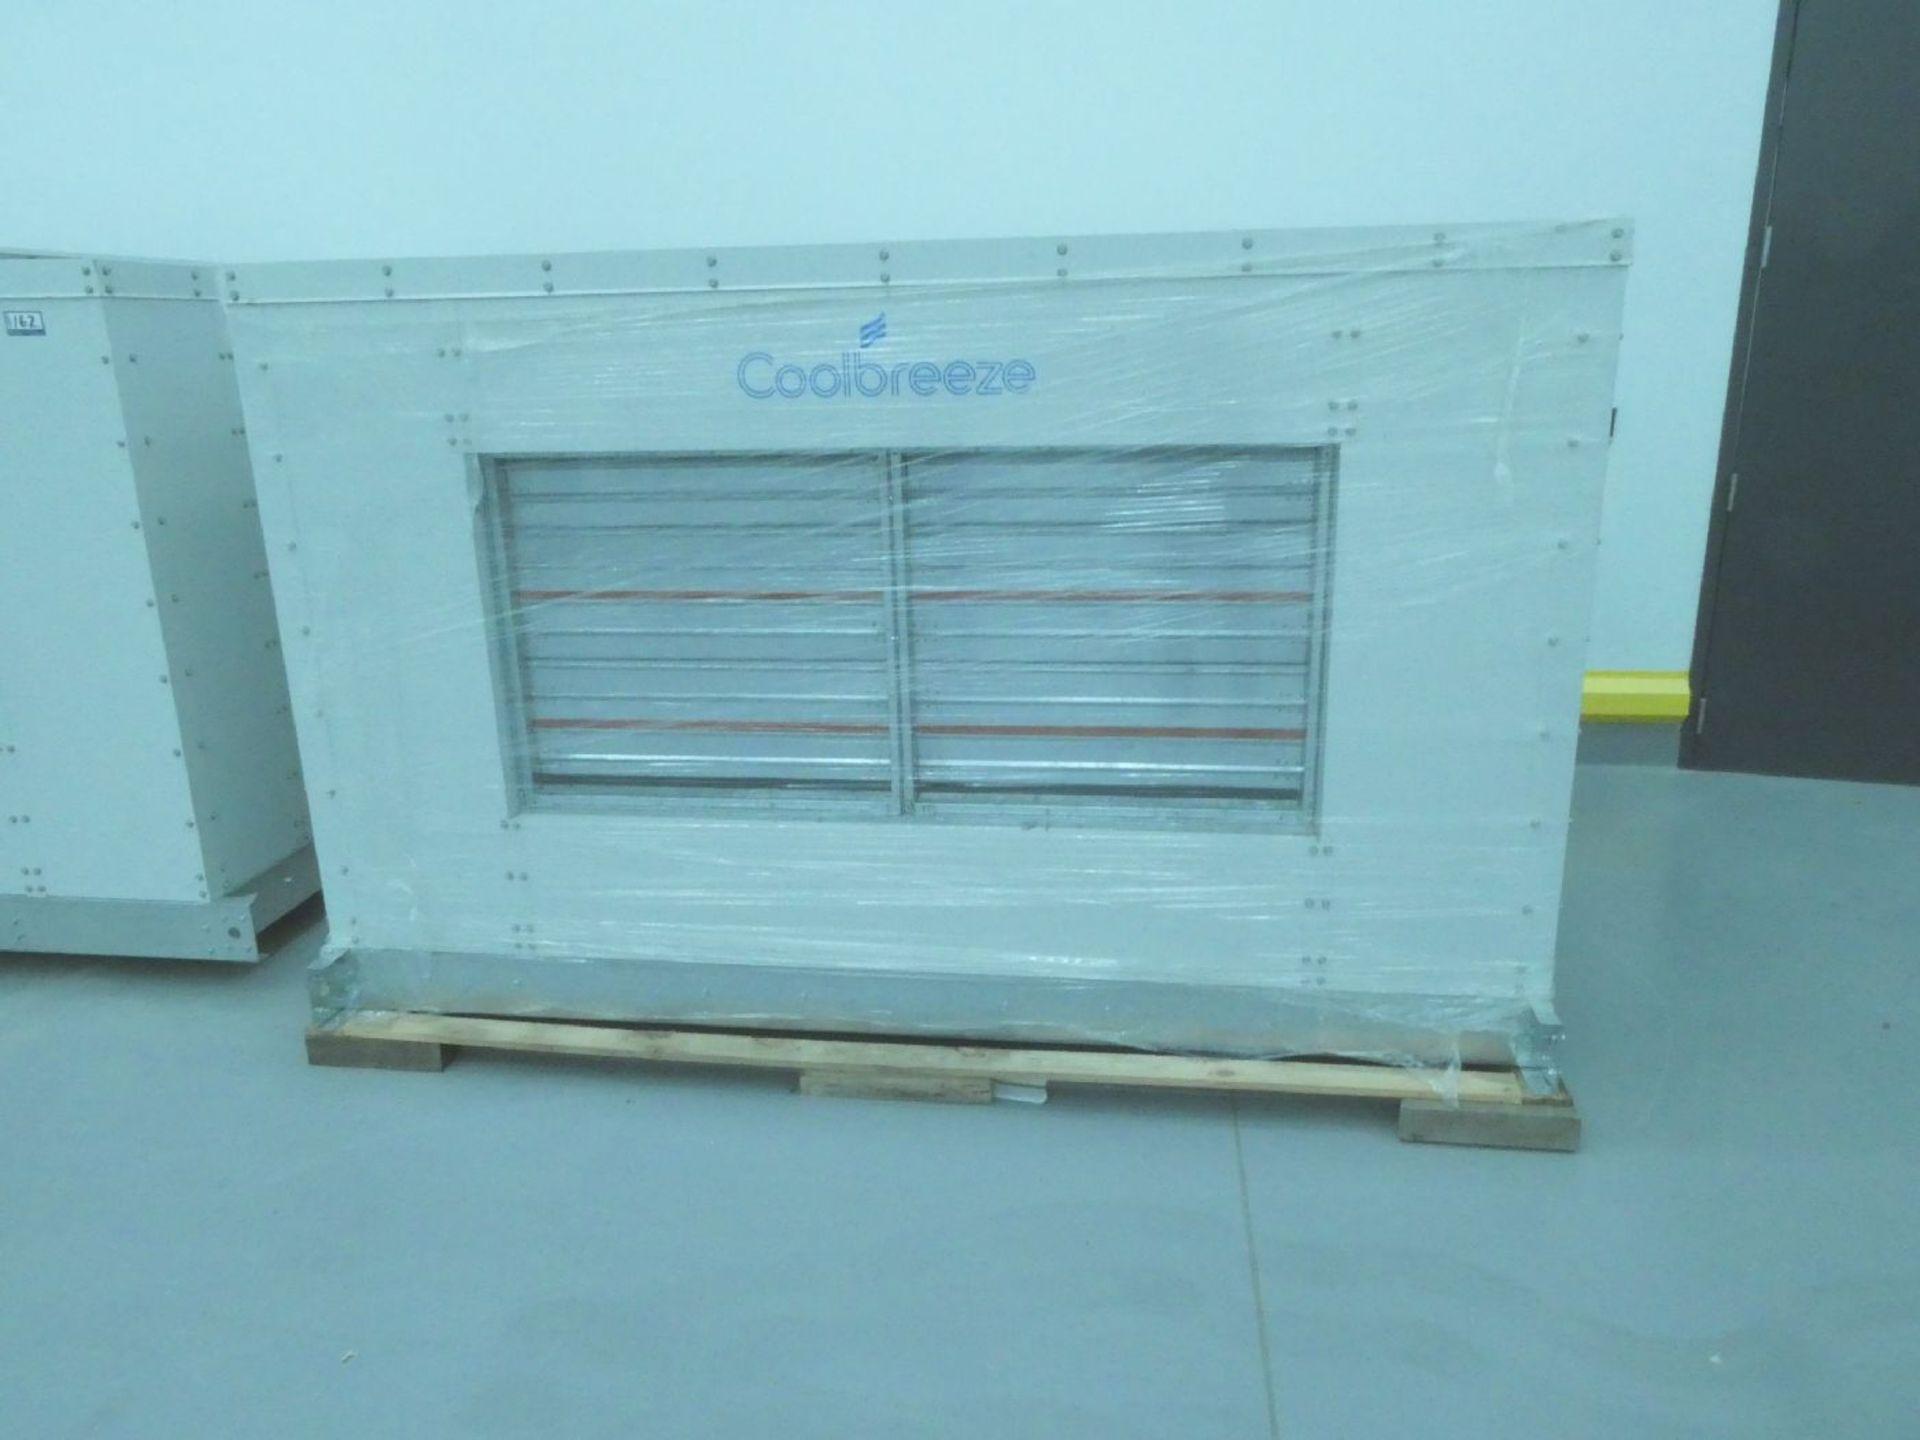 Pennair FB-D-160-E/A Coolbreeze 160,000CFM Carbon Filter Box - Image 2 of 3